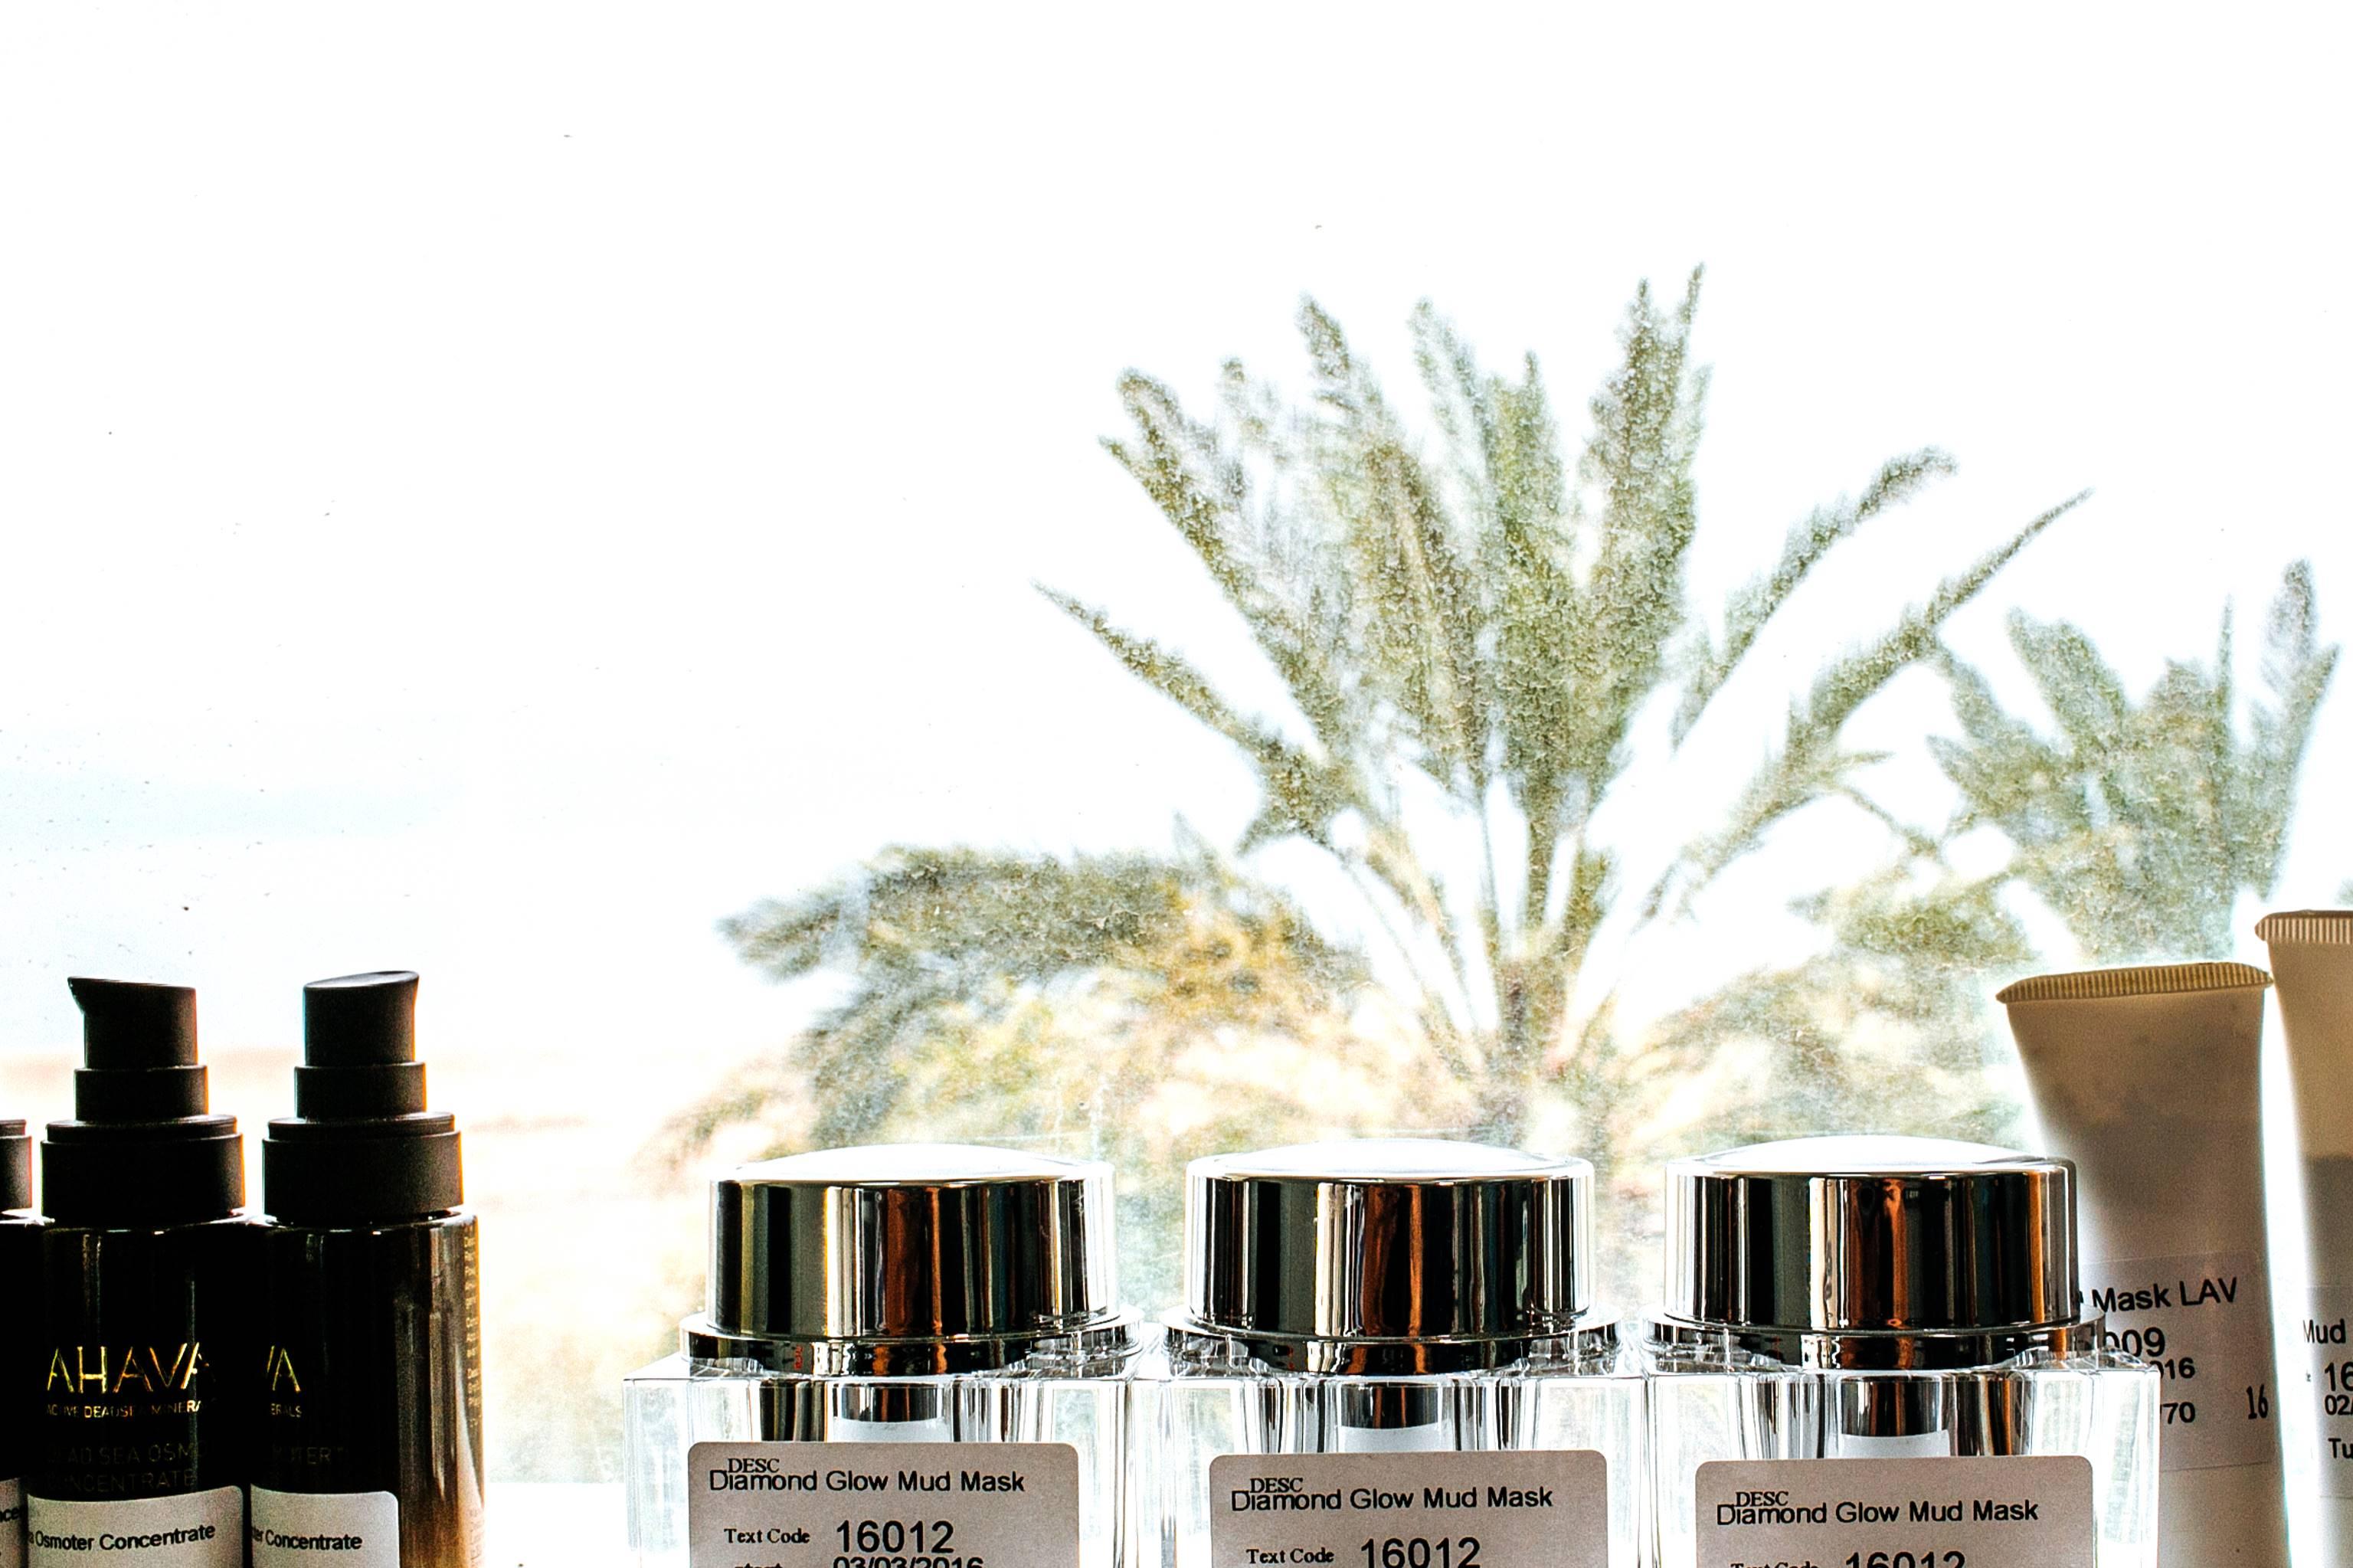 AHAVA Dead Sea Labs and Dead Sea products